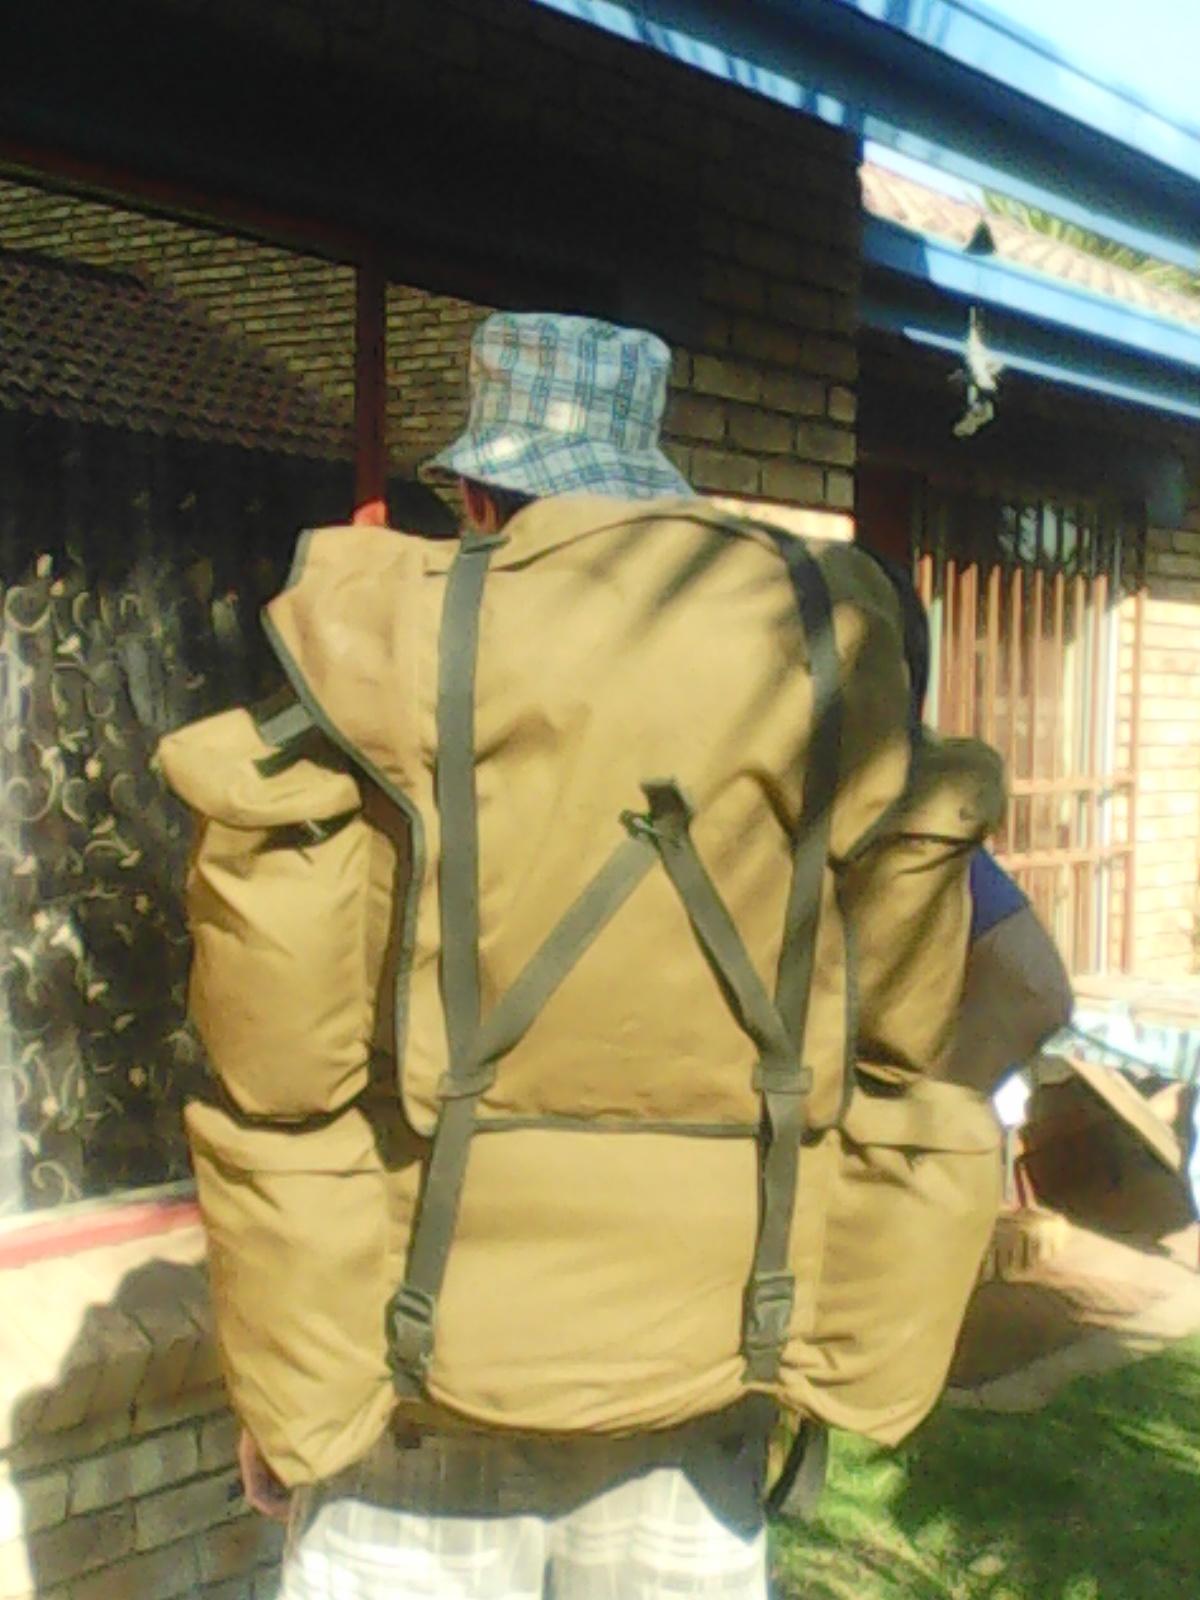 2 Hiking bags